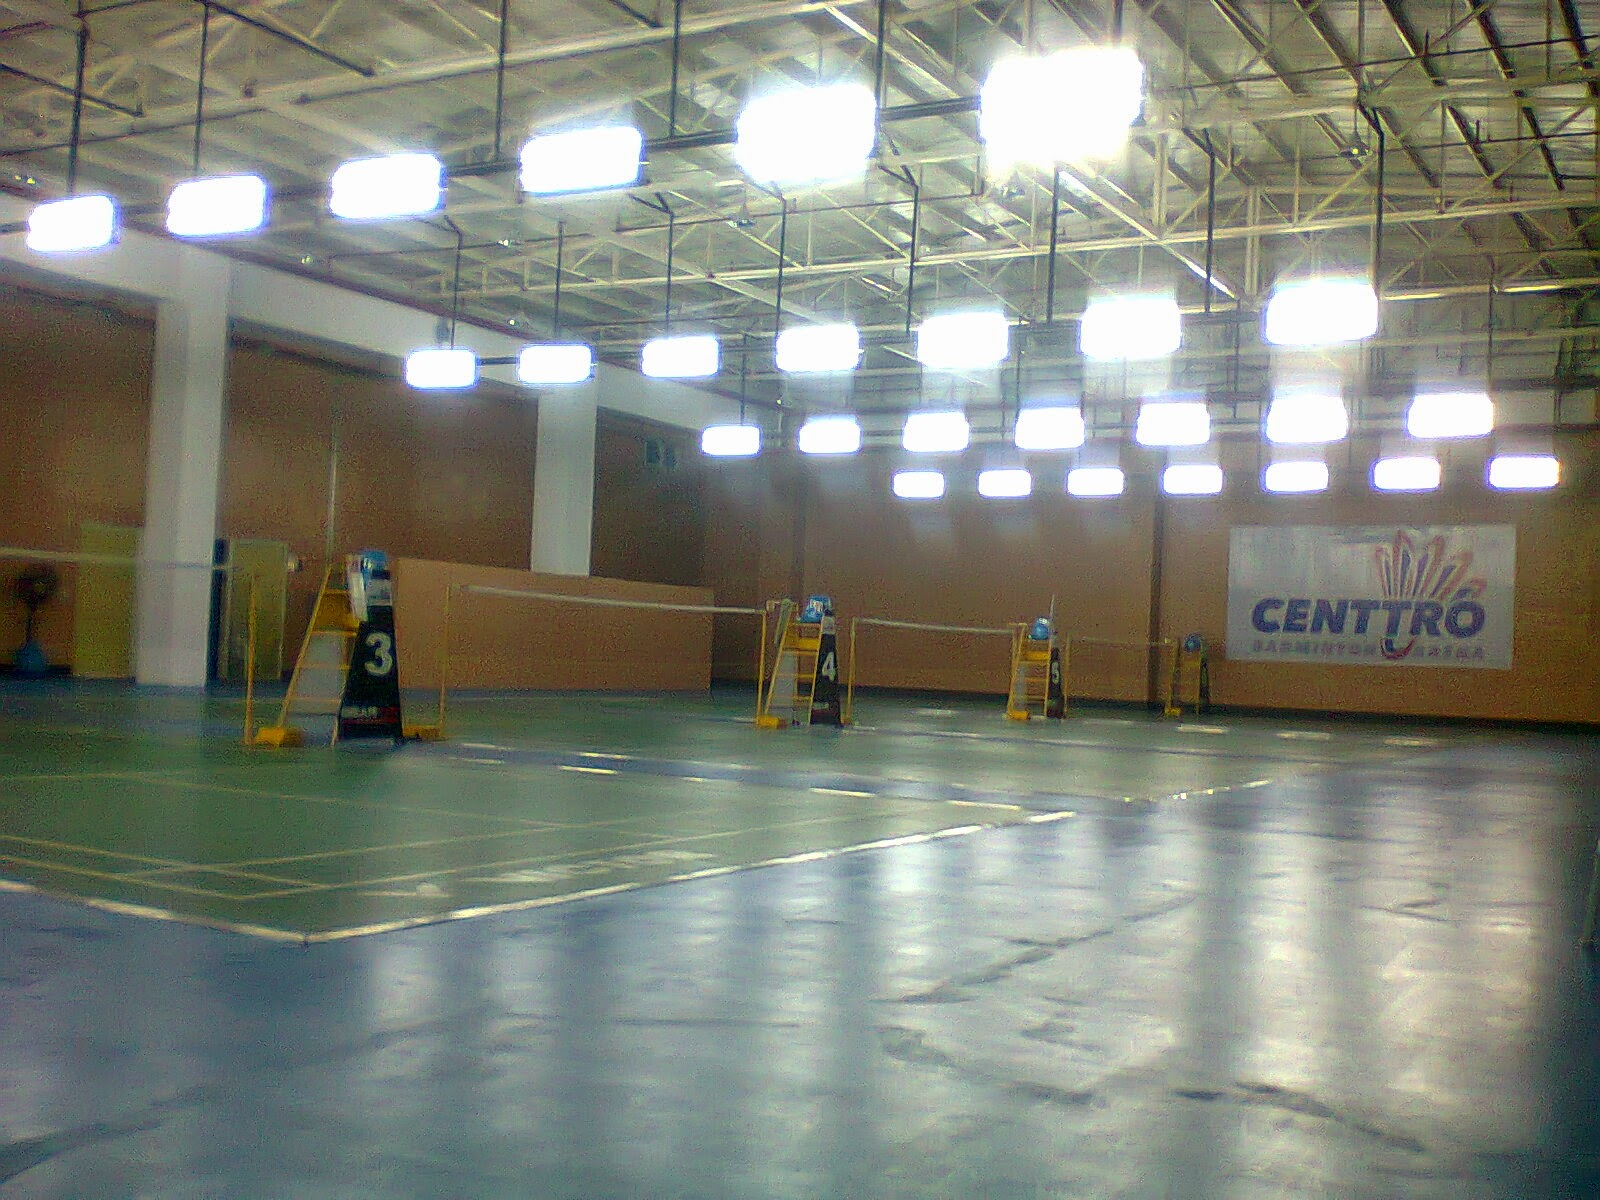 Centtro Badminton Arena